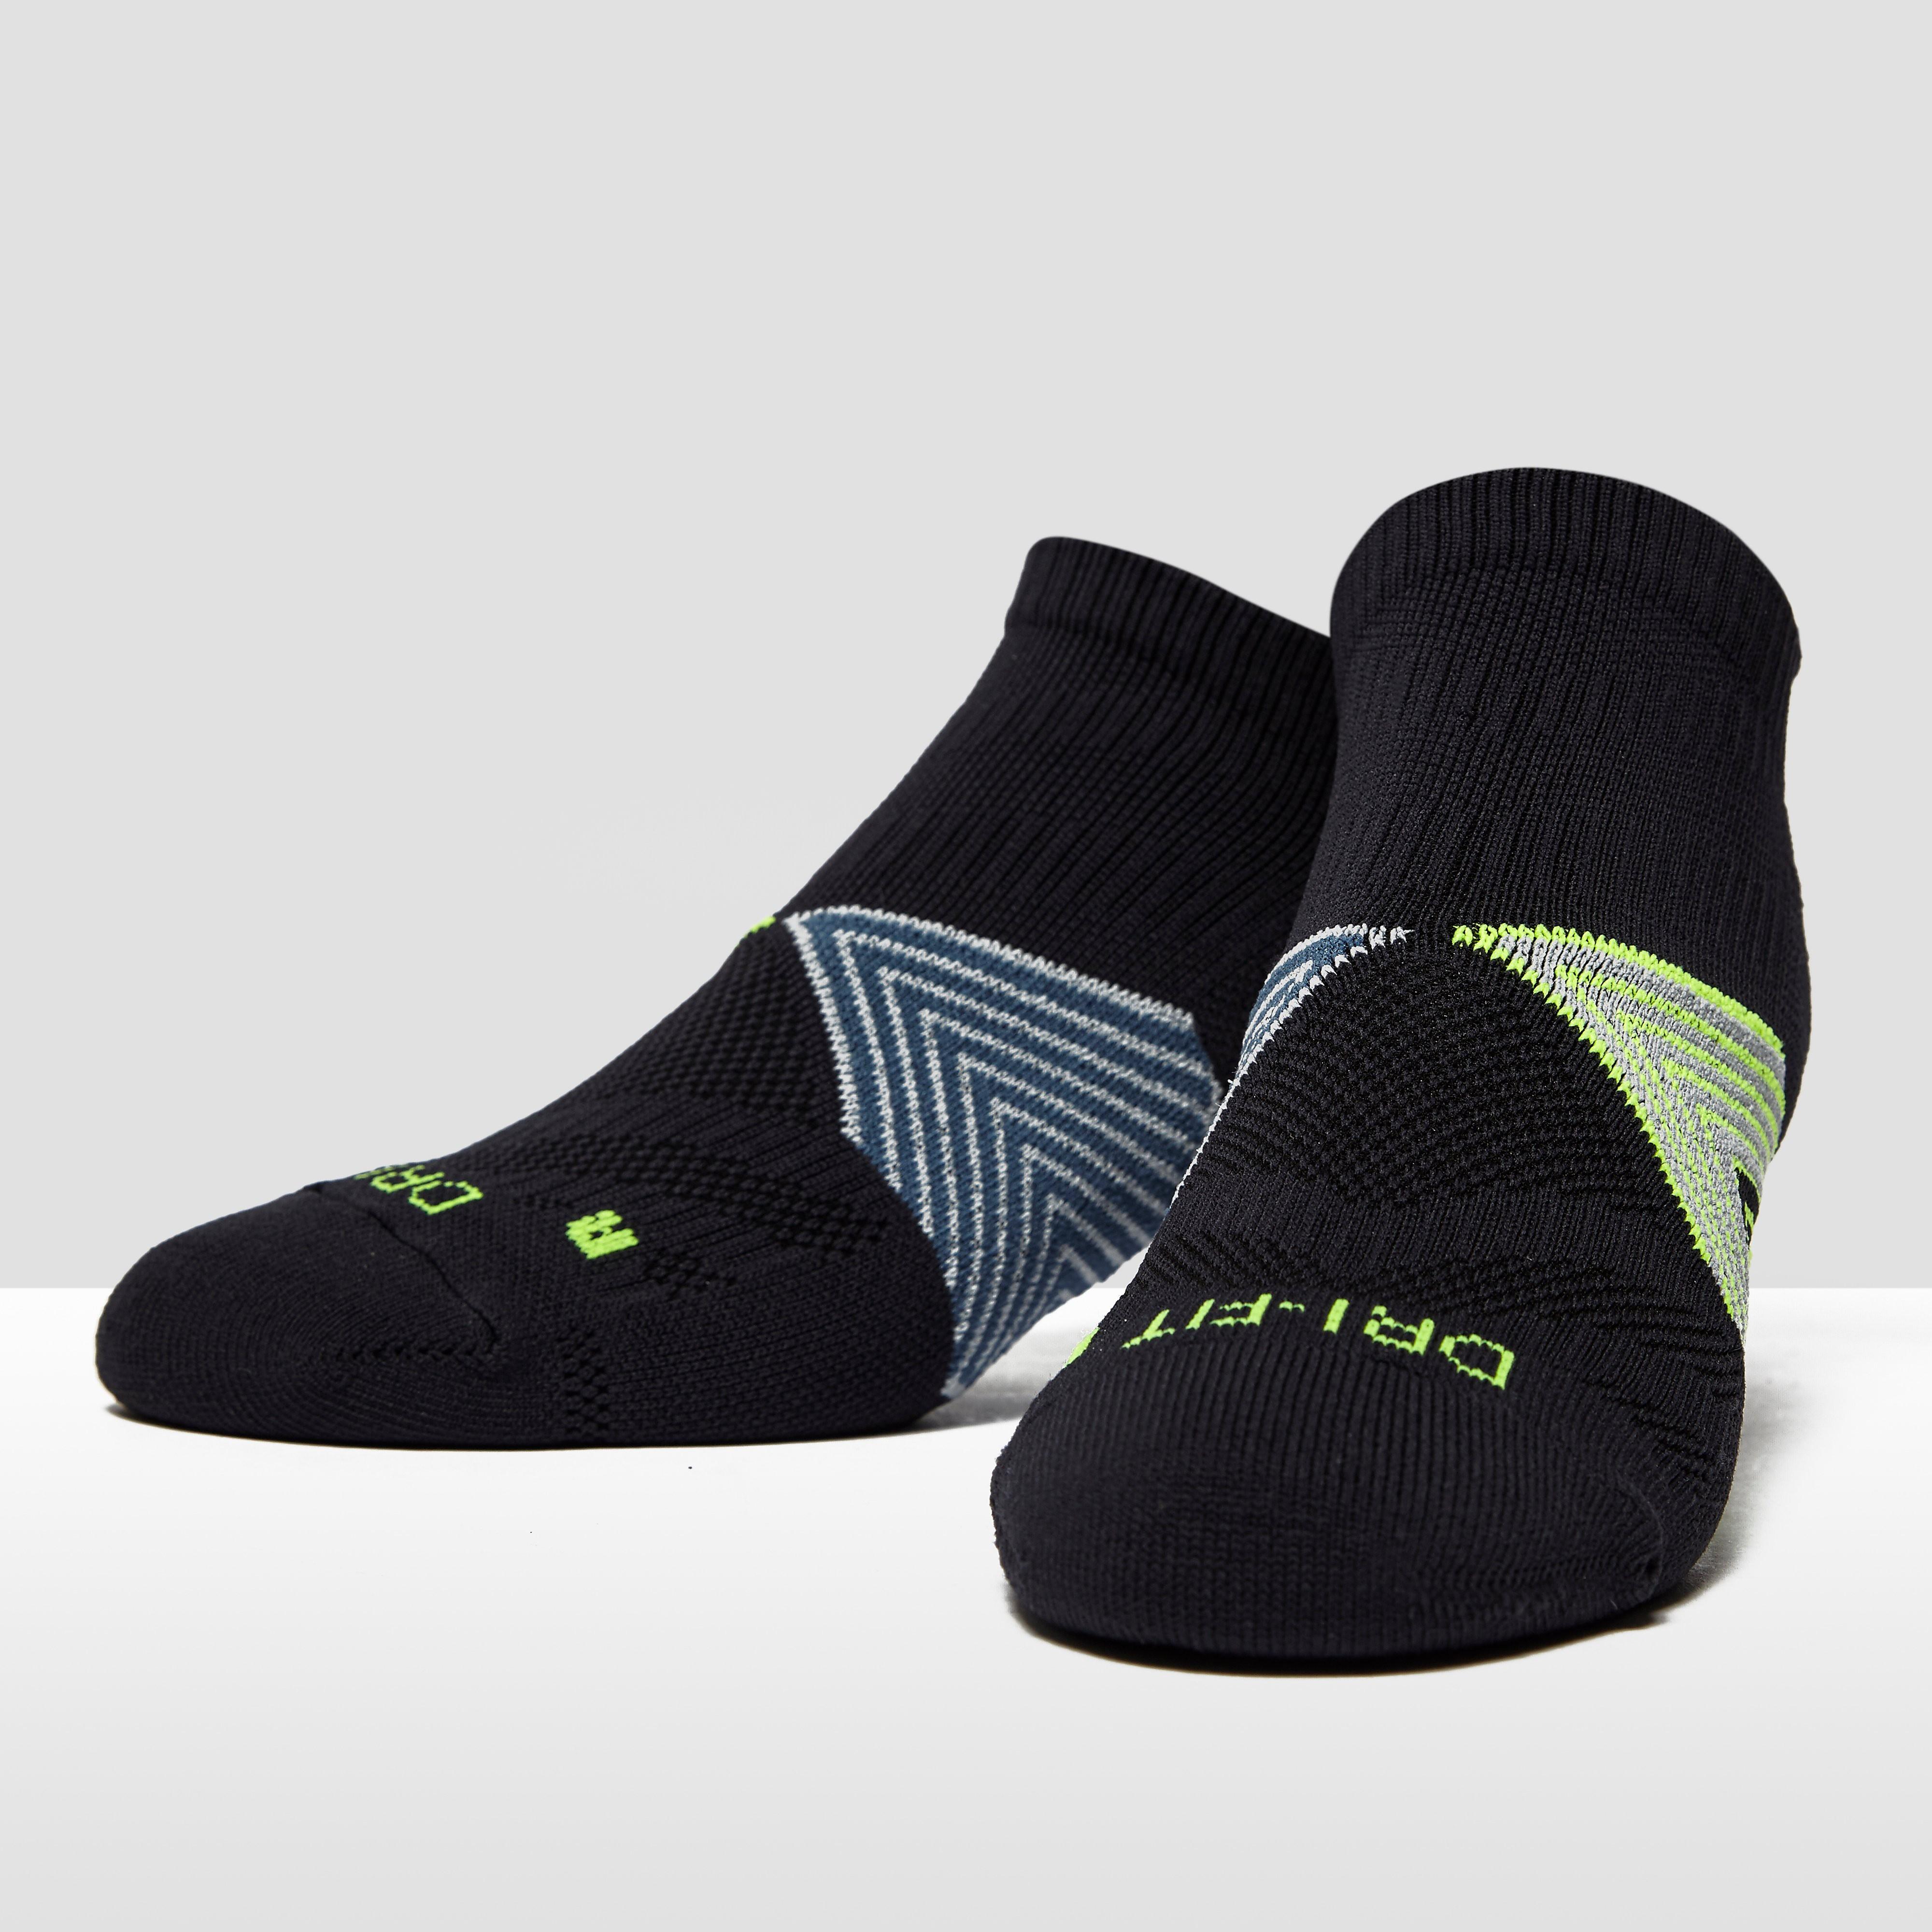 Nike Cushion Dynamic Arch Quarter Running Socks (1 Pair)